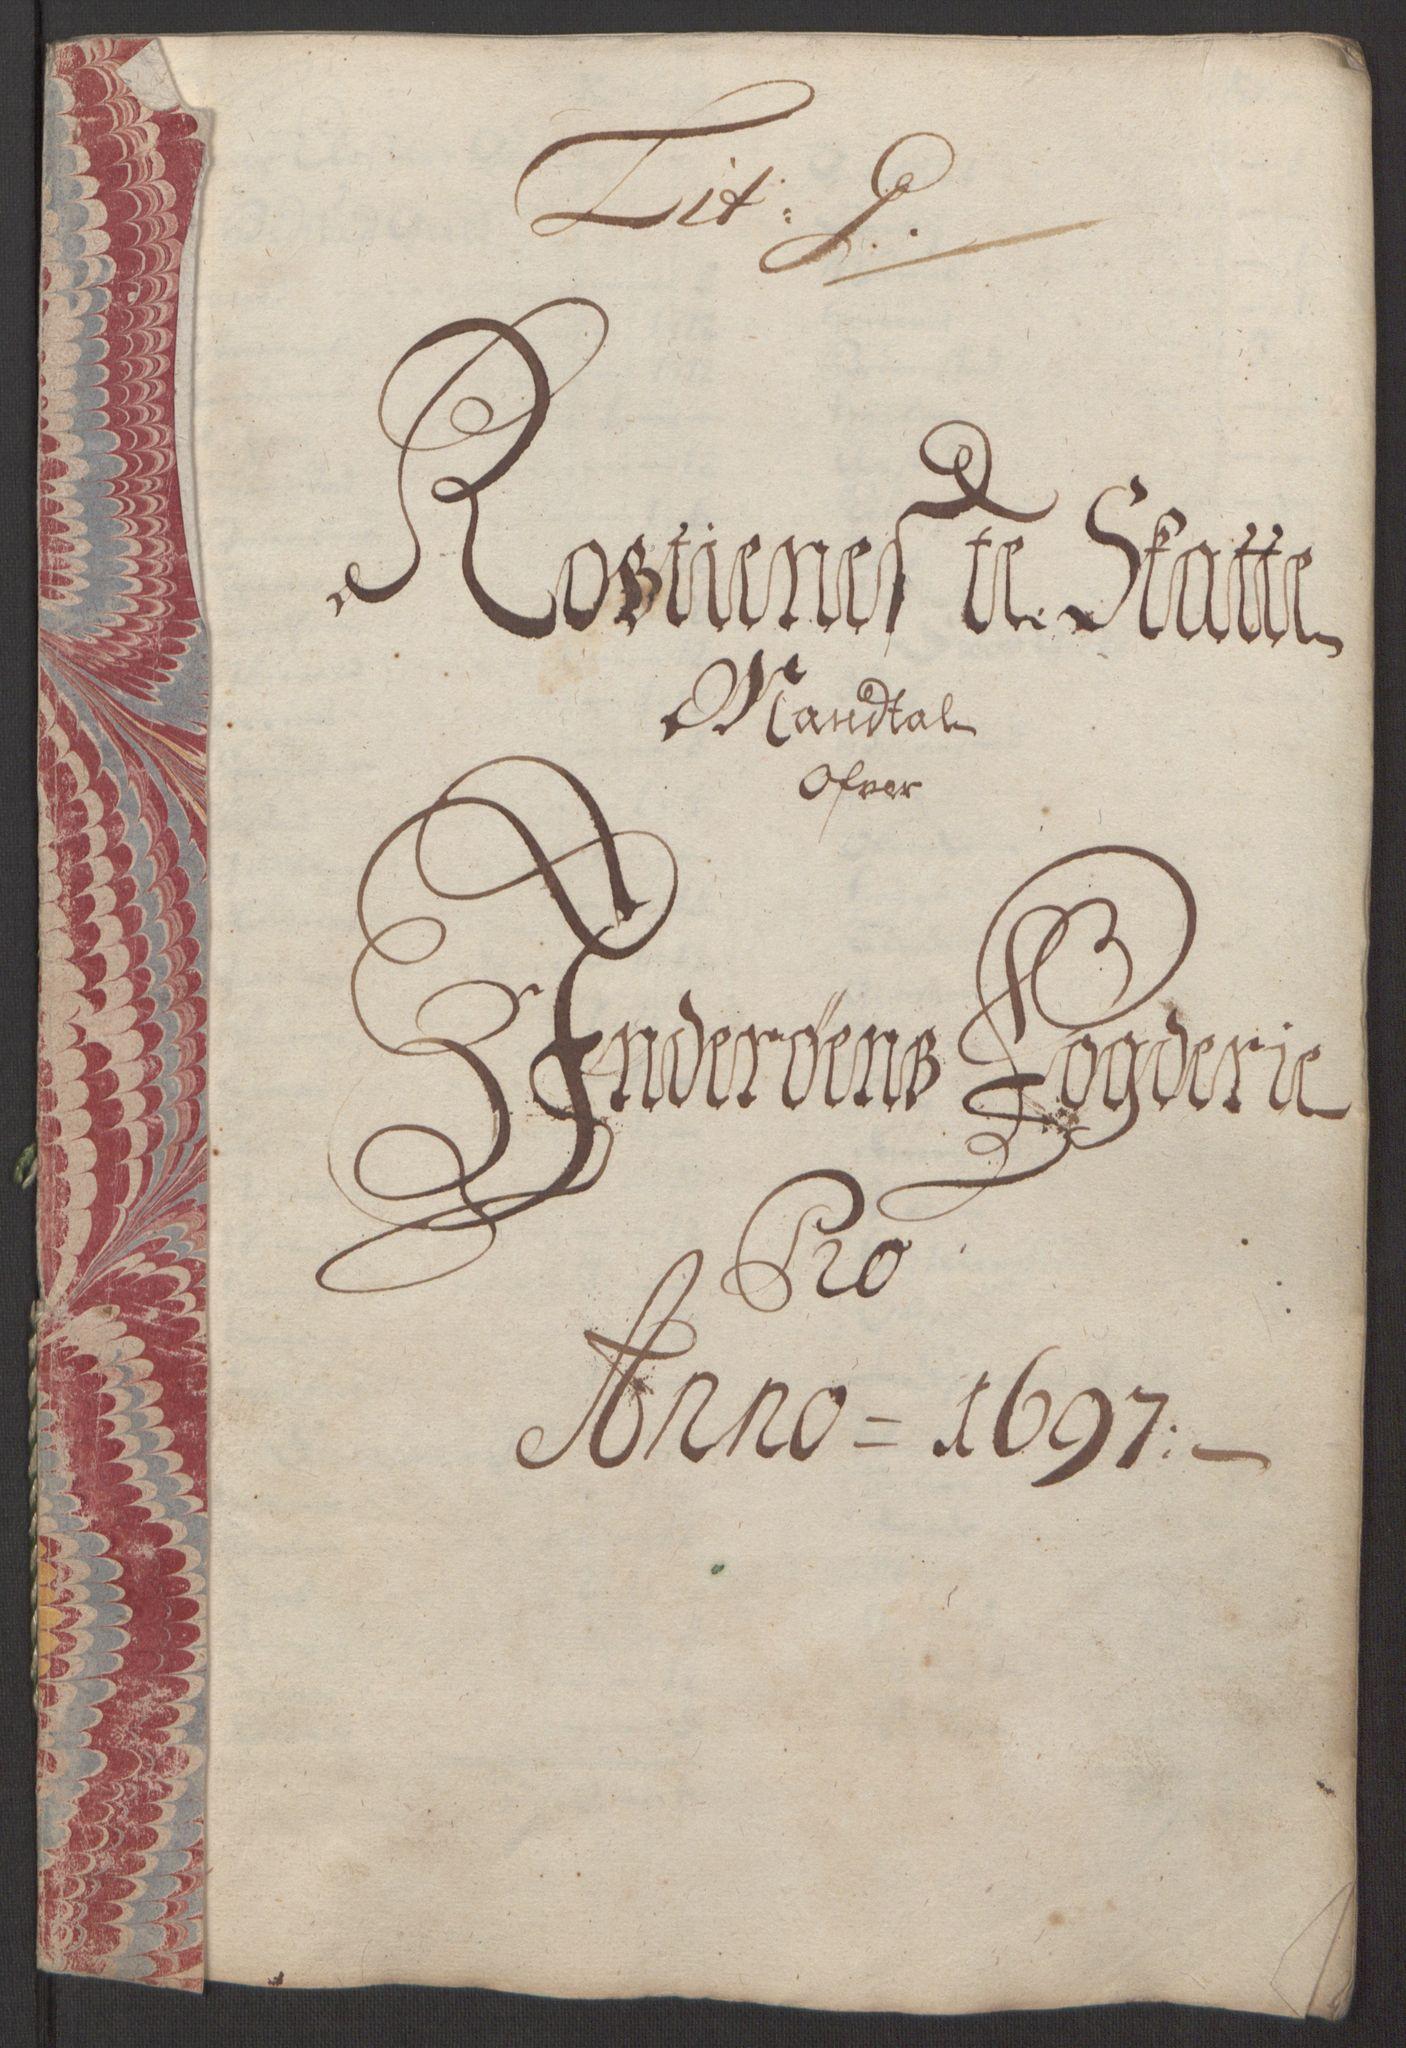 RA, Rentekammeret inntil 1814, Reviderte regnskaper, Fogderegnskap, R63/L4309: Fogderegnskap Inderøy, 1695-1697, s. 452